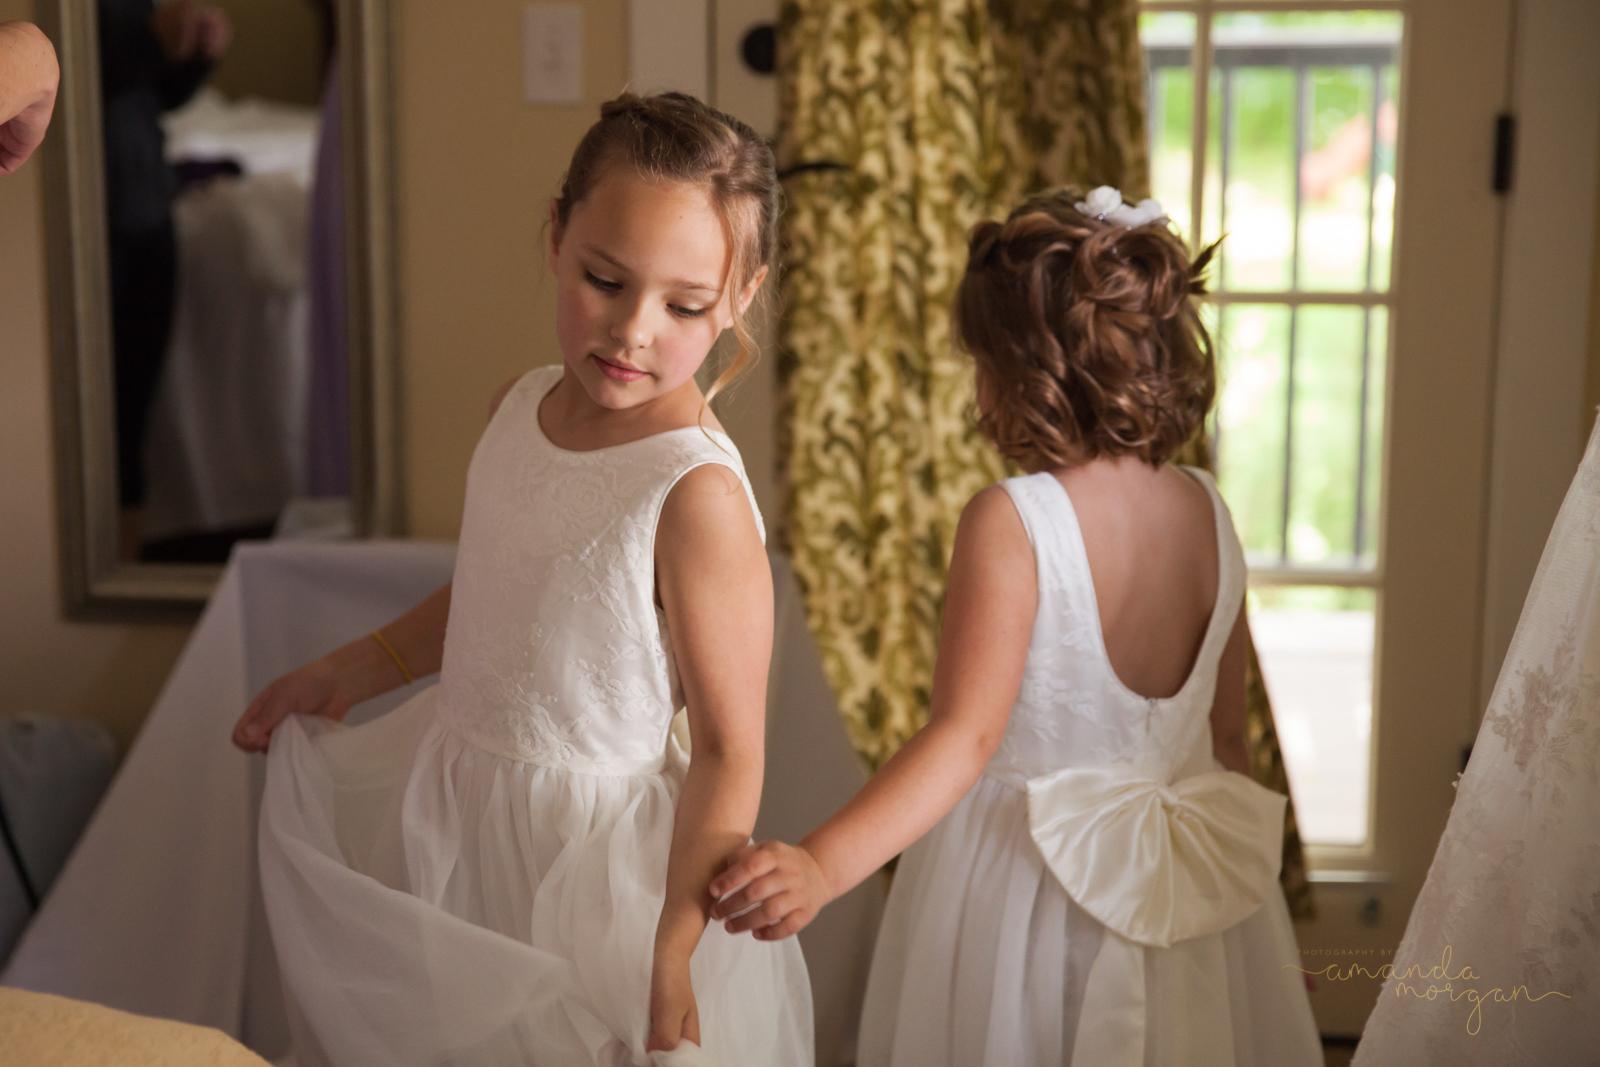 Publick-House-Wedding-Amanda-Morgan-7.jpg